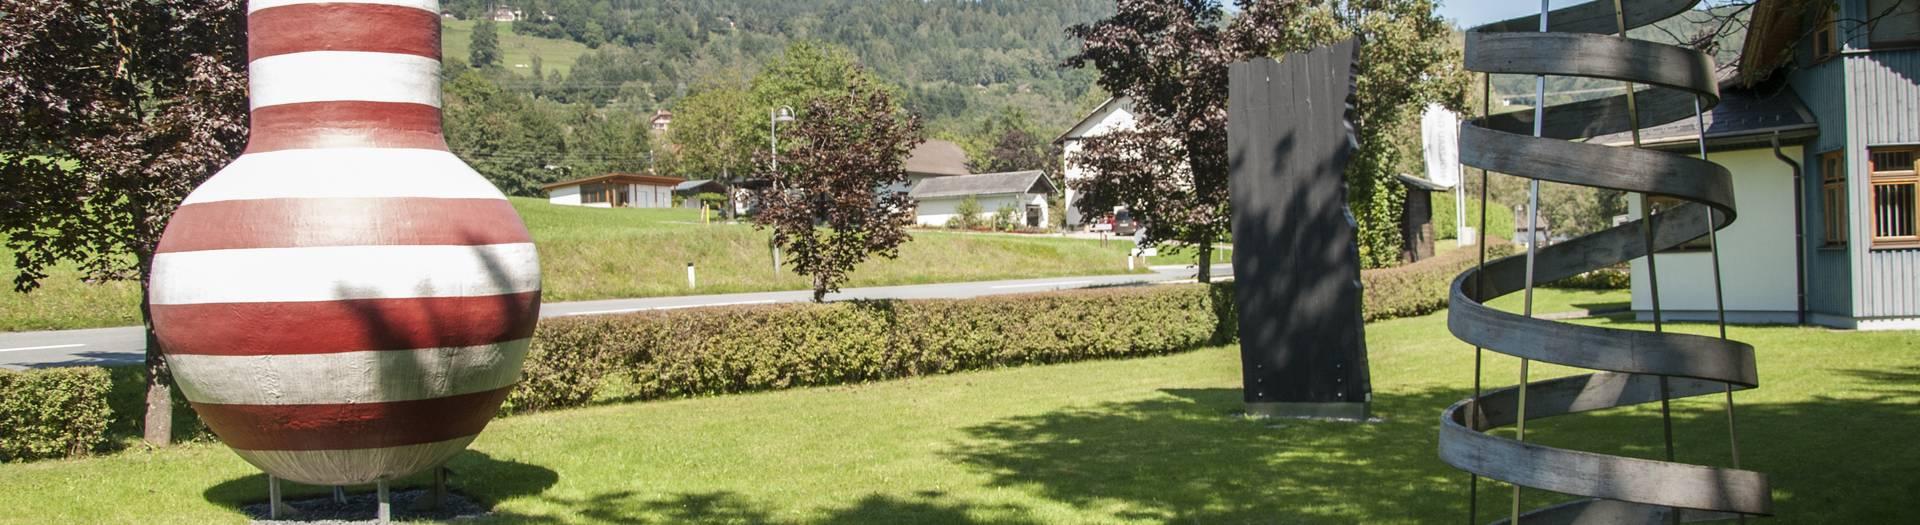 Skulpturenpark in Ludmannsdorf im Rosental